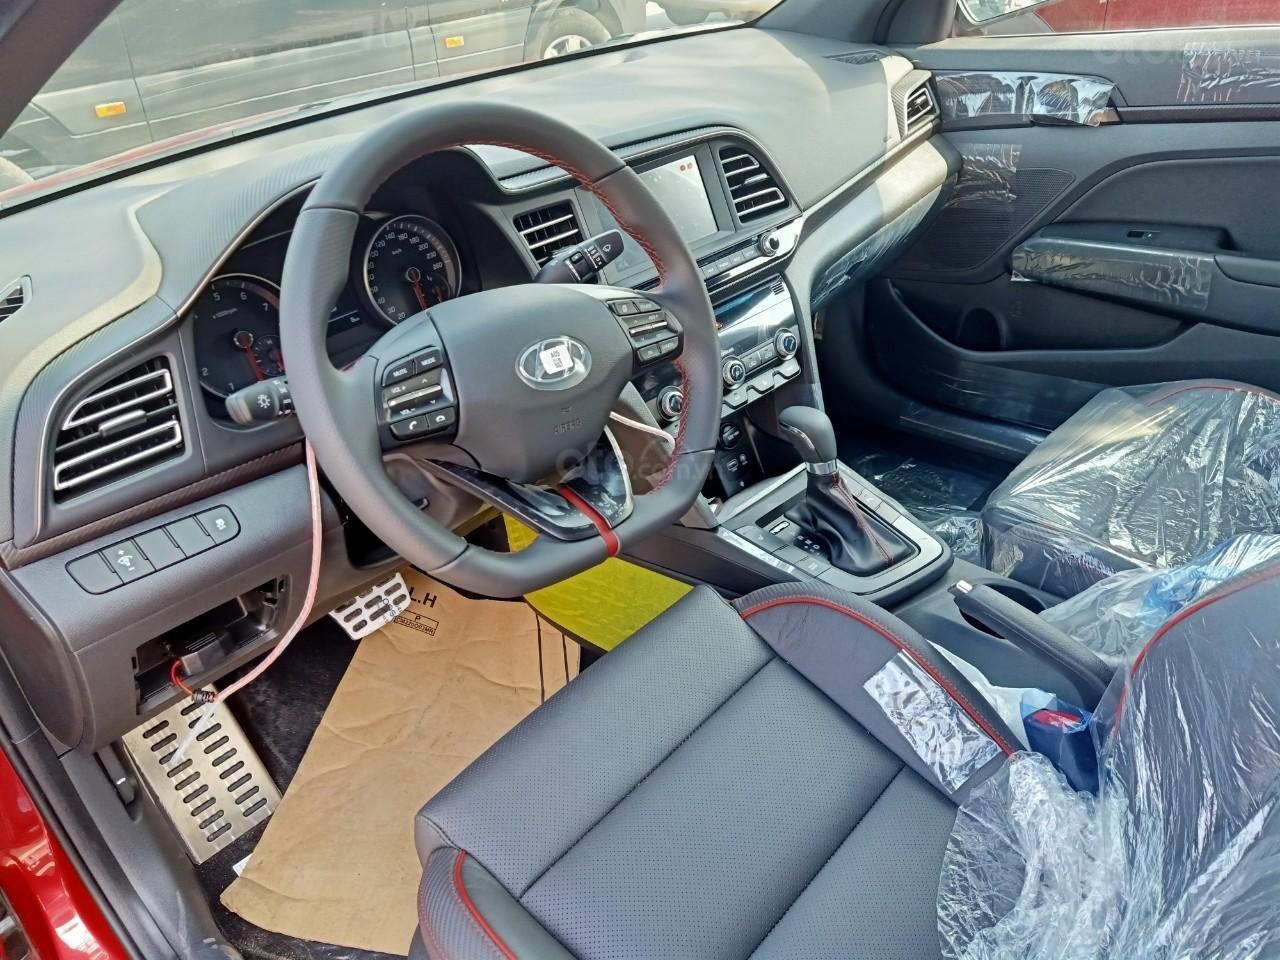 Hyundai Elantra 1.6AT Sport đỏ+ Sale sốc KM 40 triệu+ xe giao ngay (6)